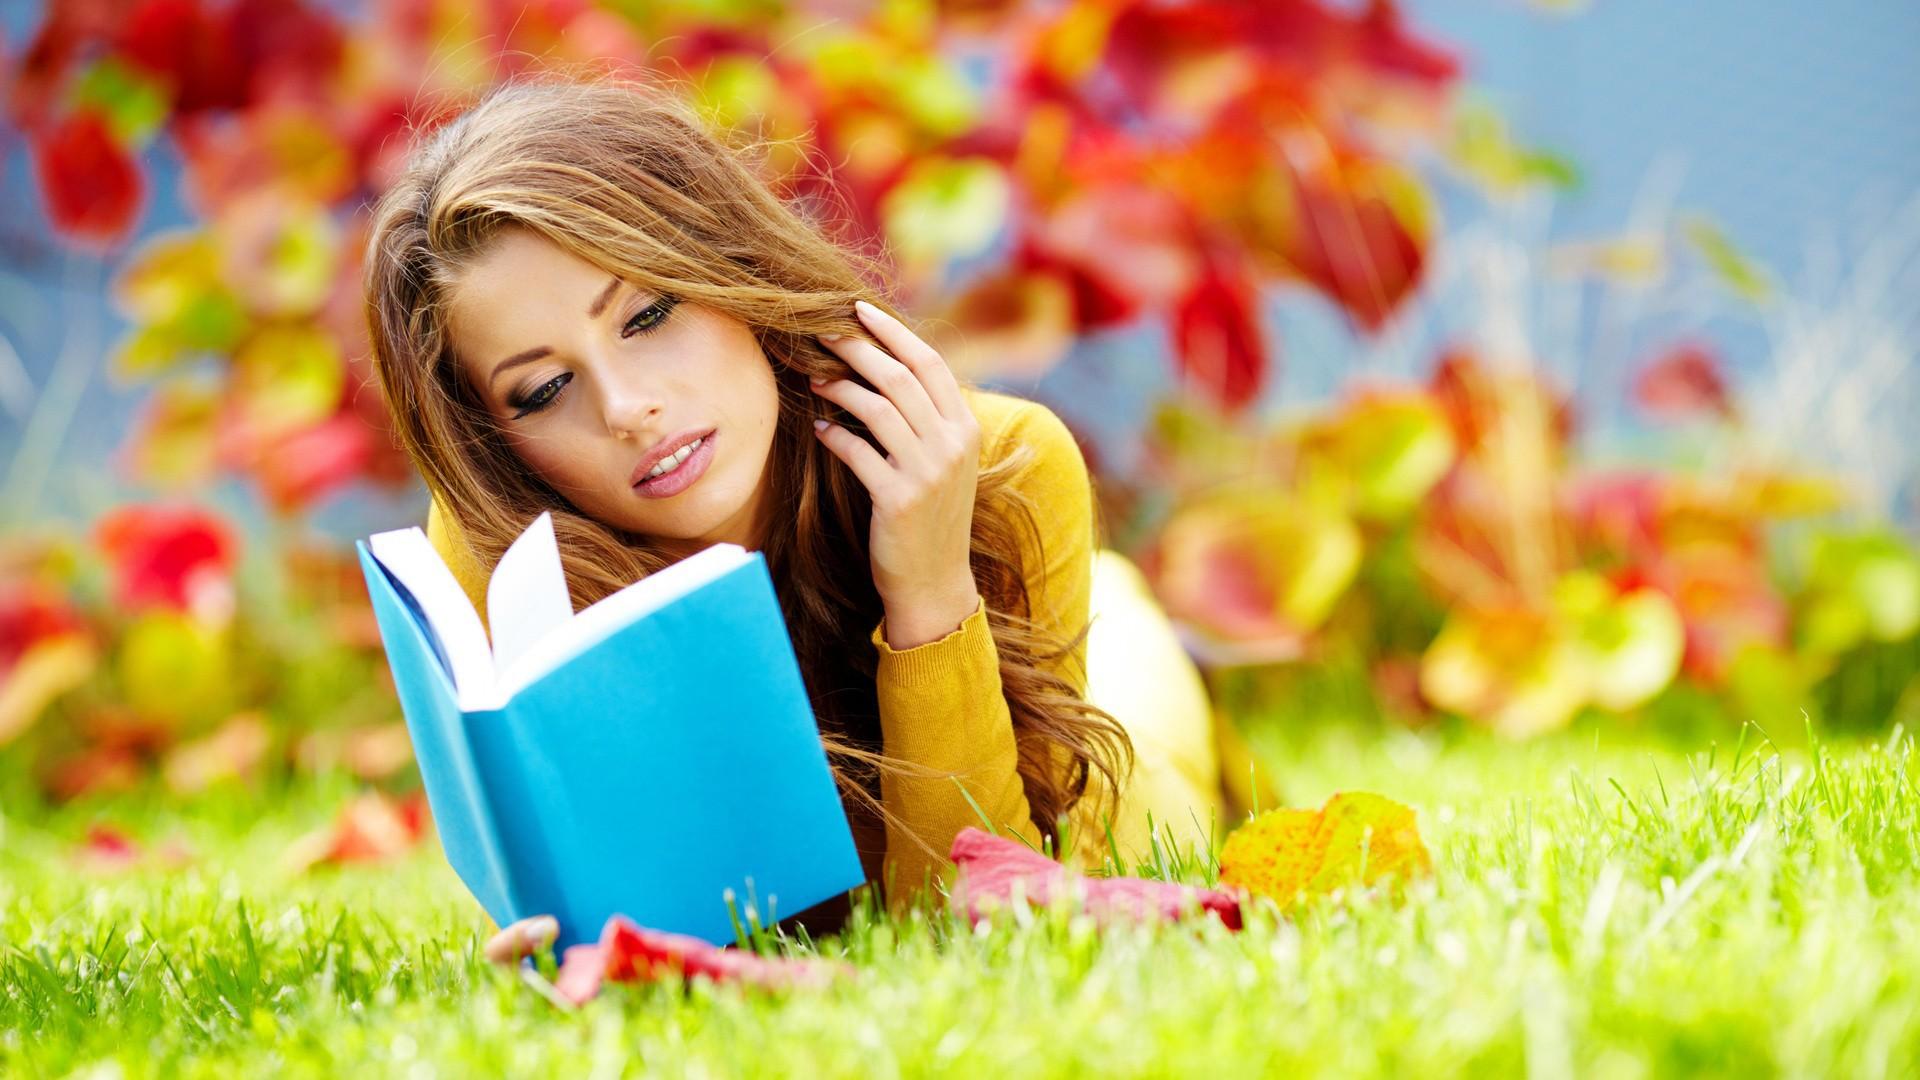 Girls___Beautyful_Girls_Reading_the_book_of_nature_042864_